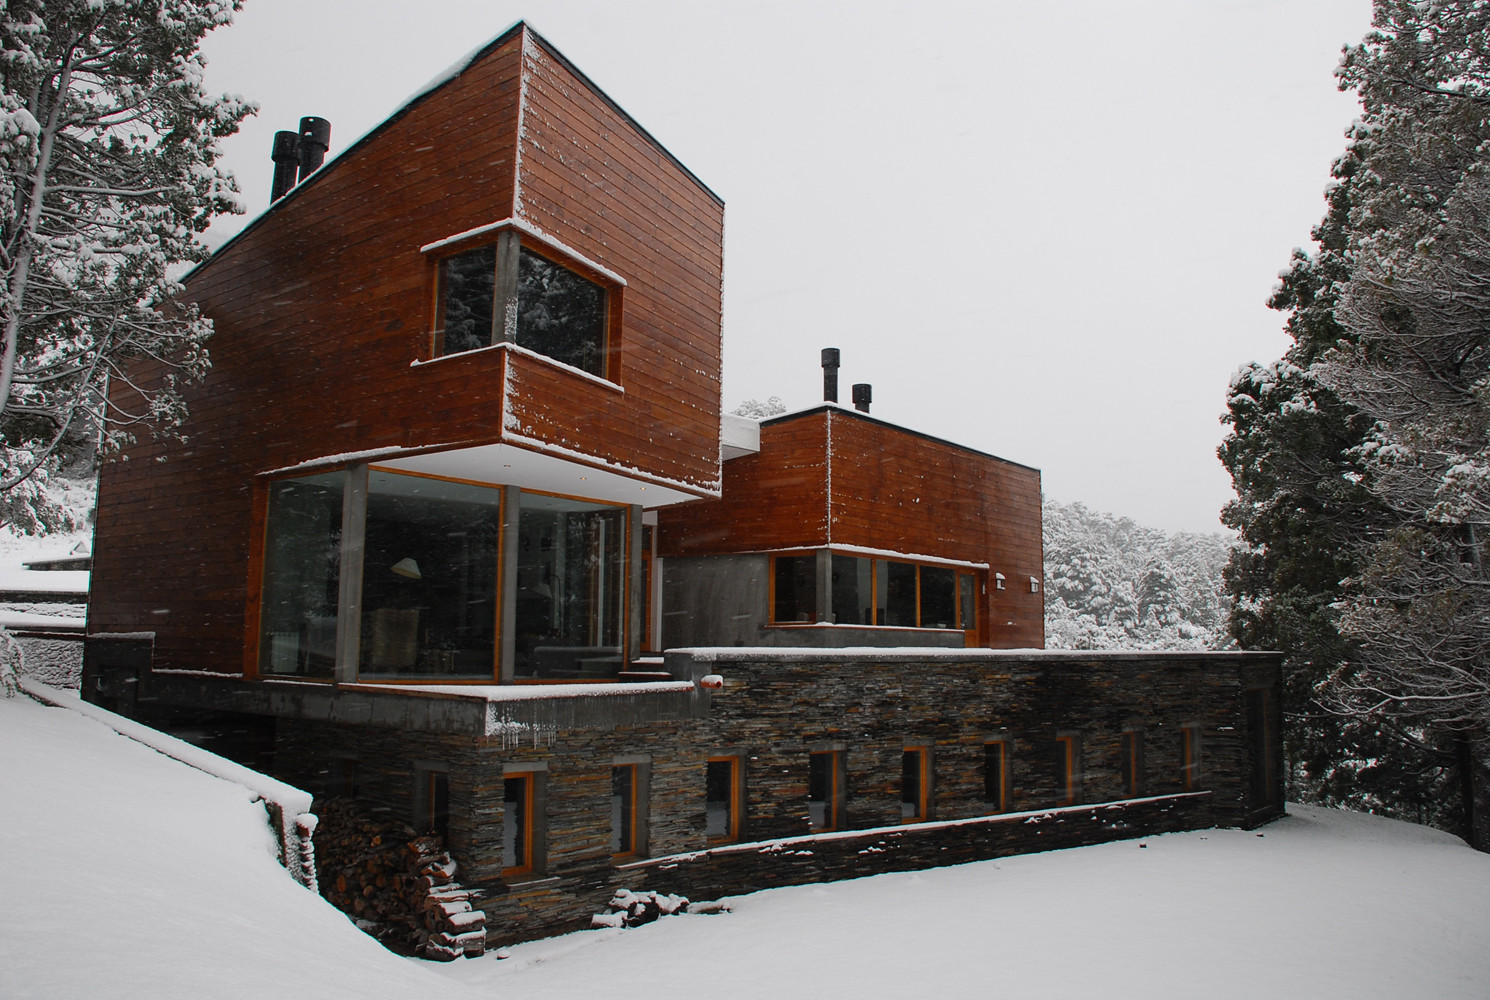 Los Cerezos House / G2 Estudio, © Laila Sartoni